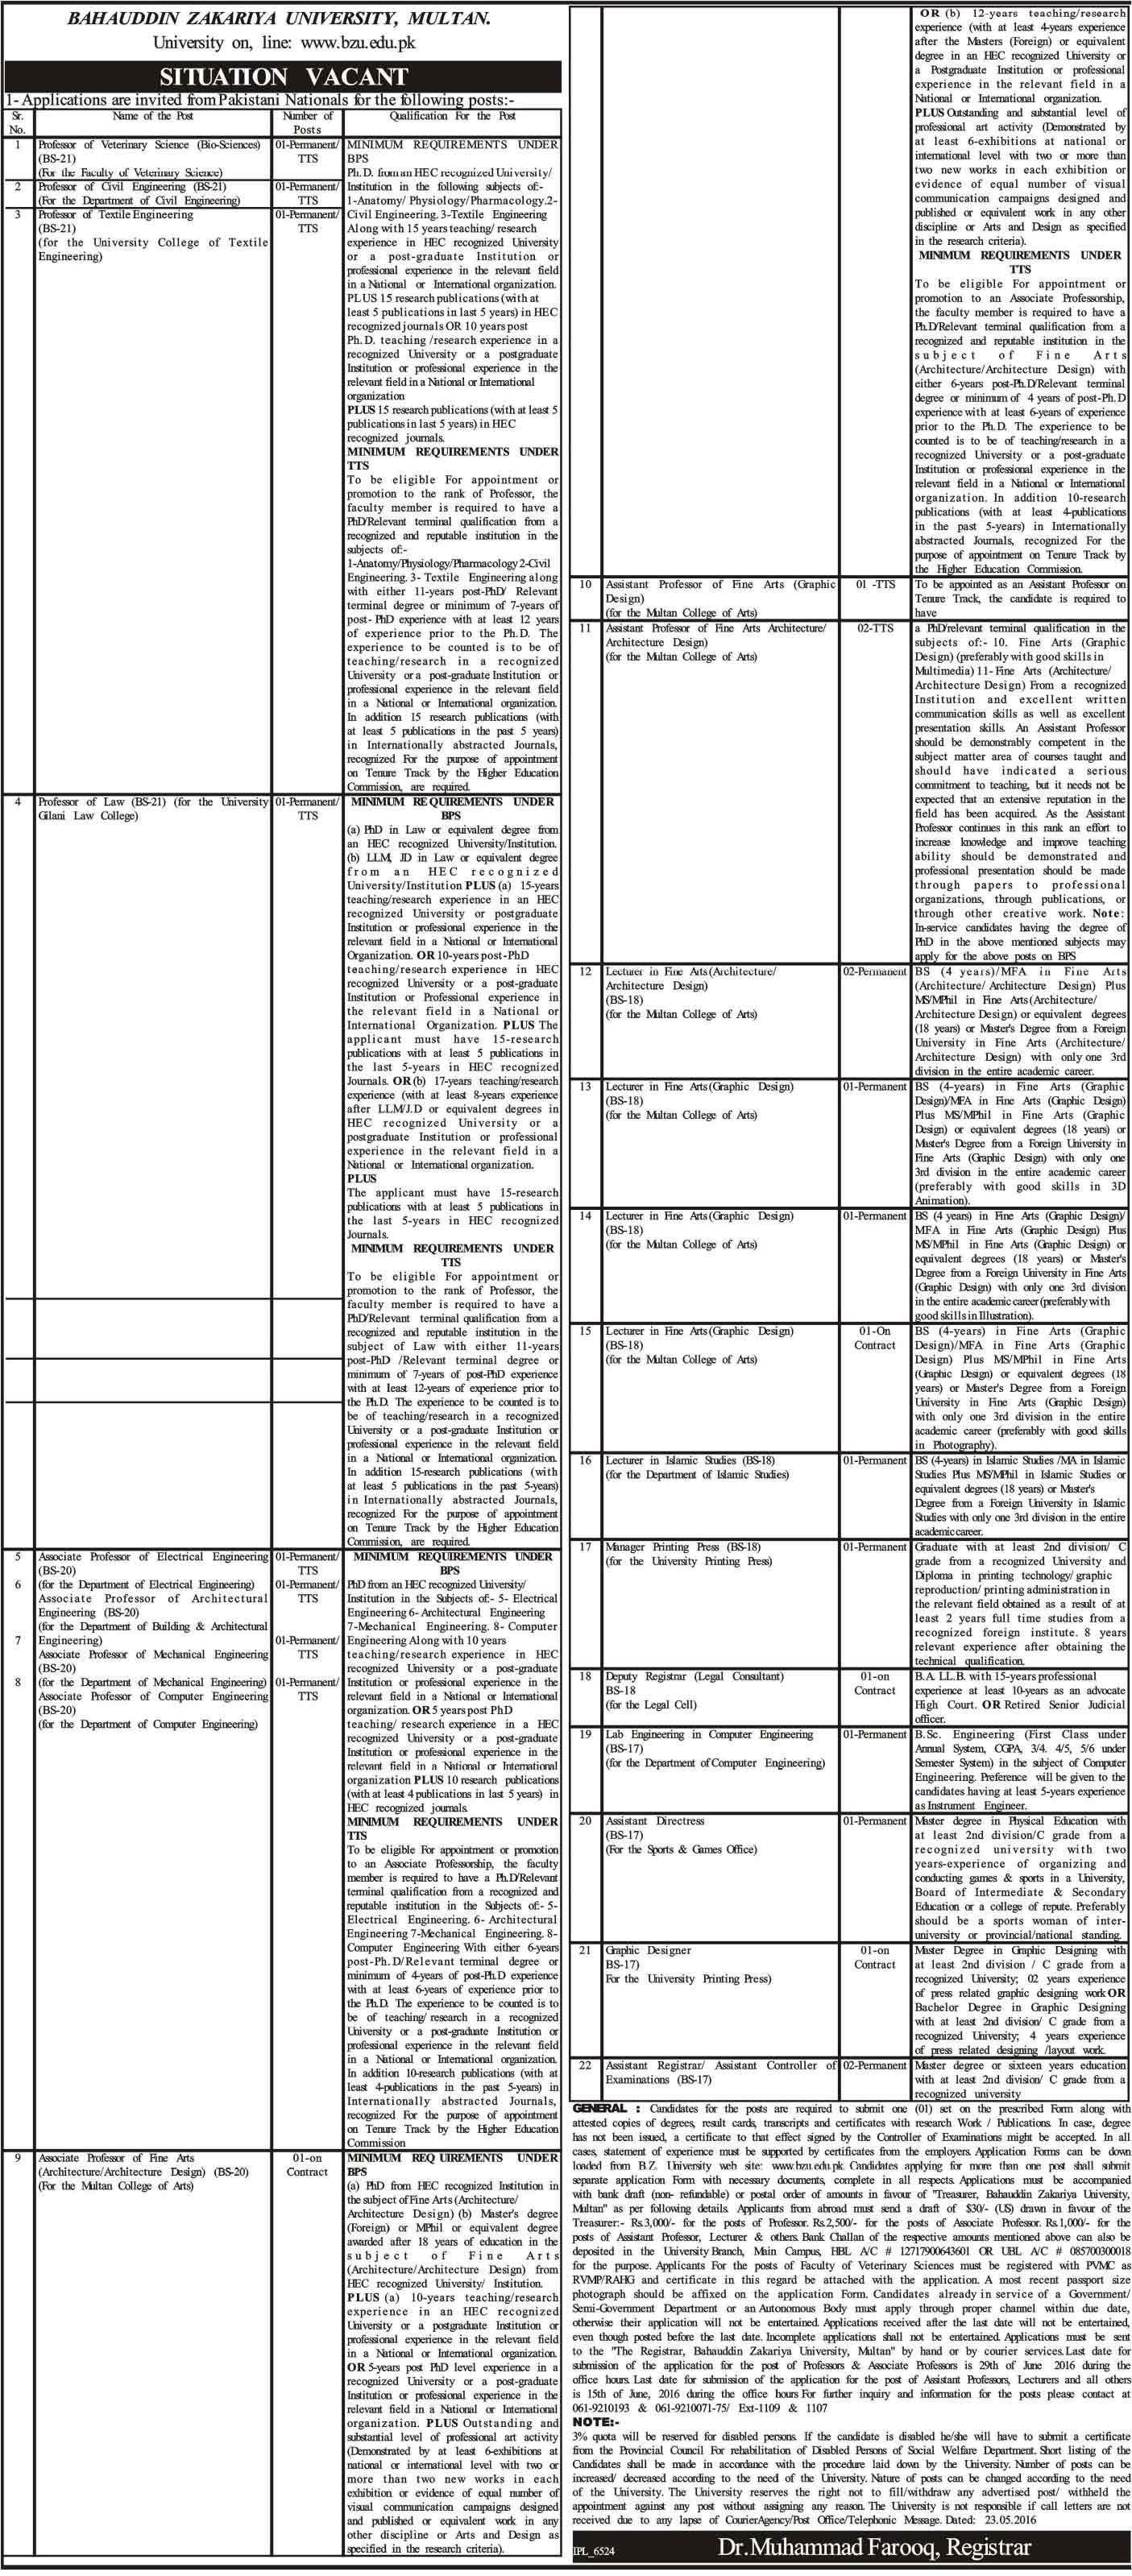 Bahuddin Zakariya University Multan Jobs 2016